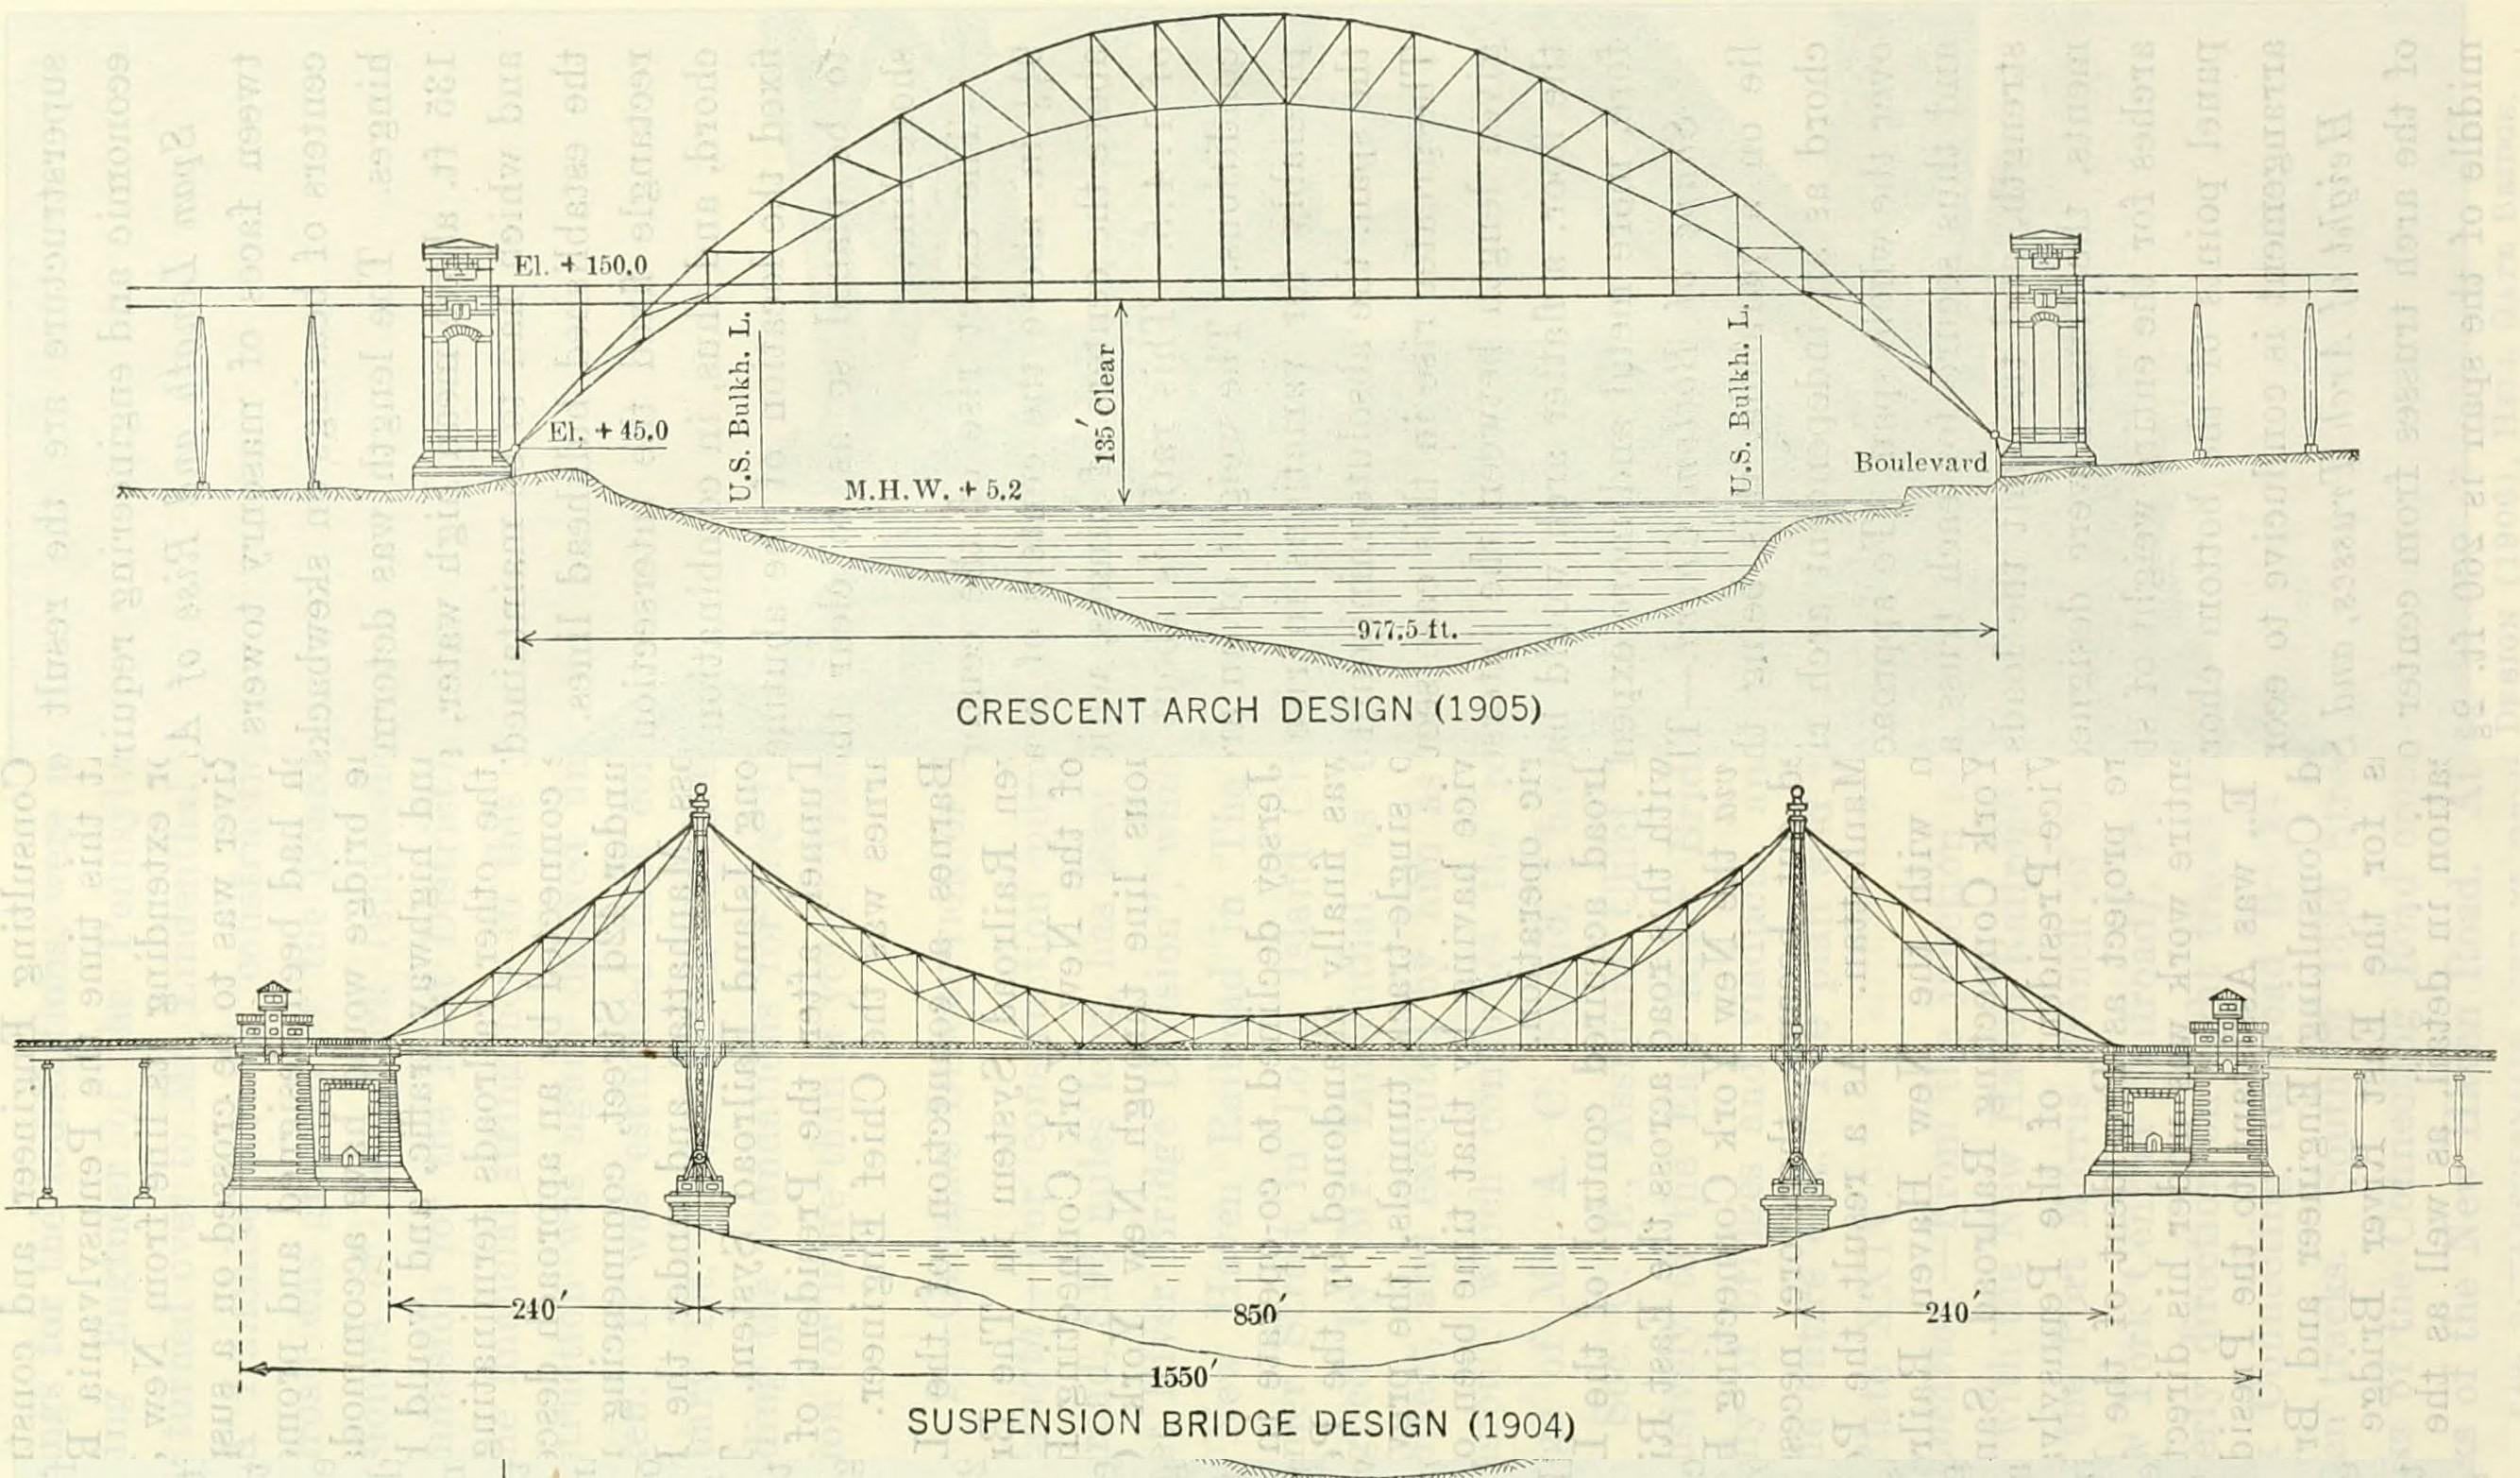 2669x1565 Hell Gate Bridge (New York Connecting Railroad Bridge